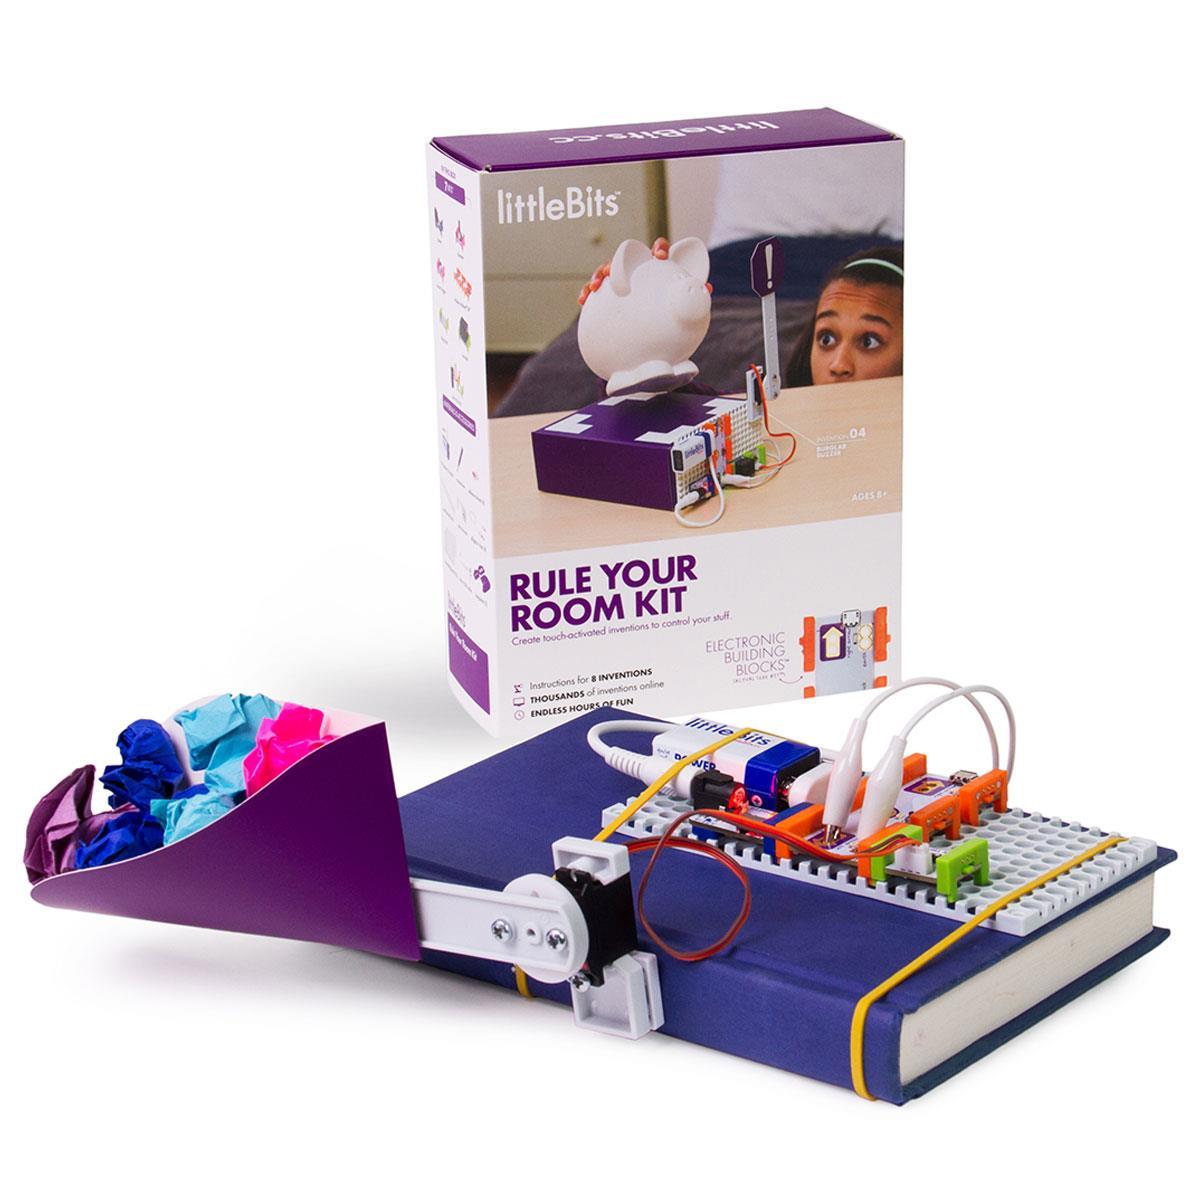 LittleBits / Rule Your Room